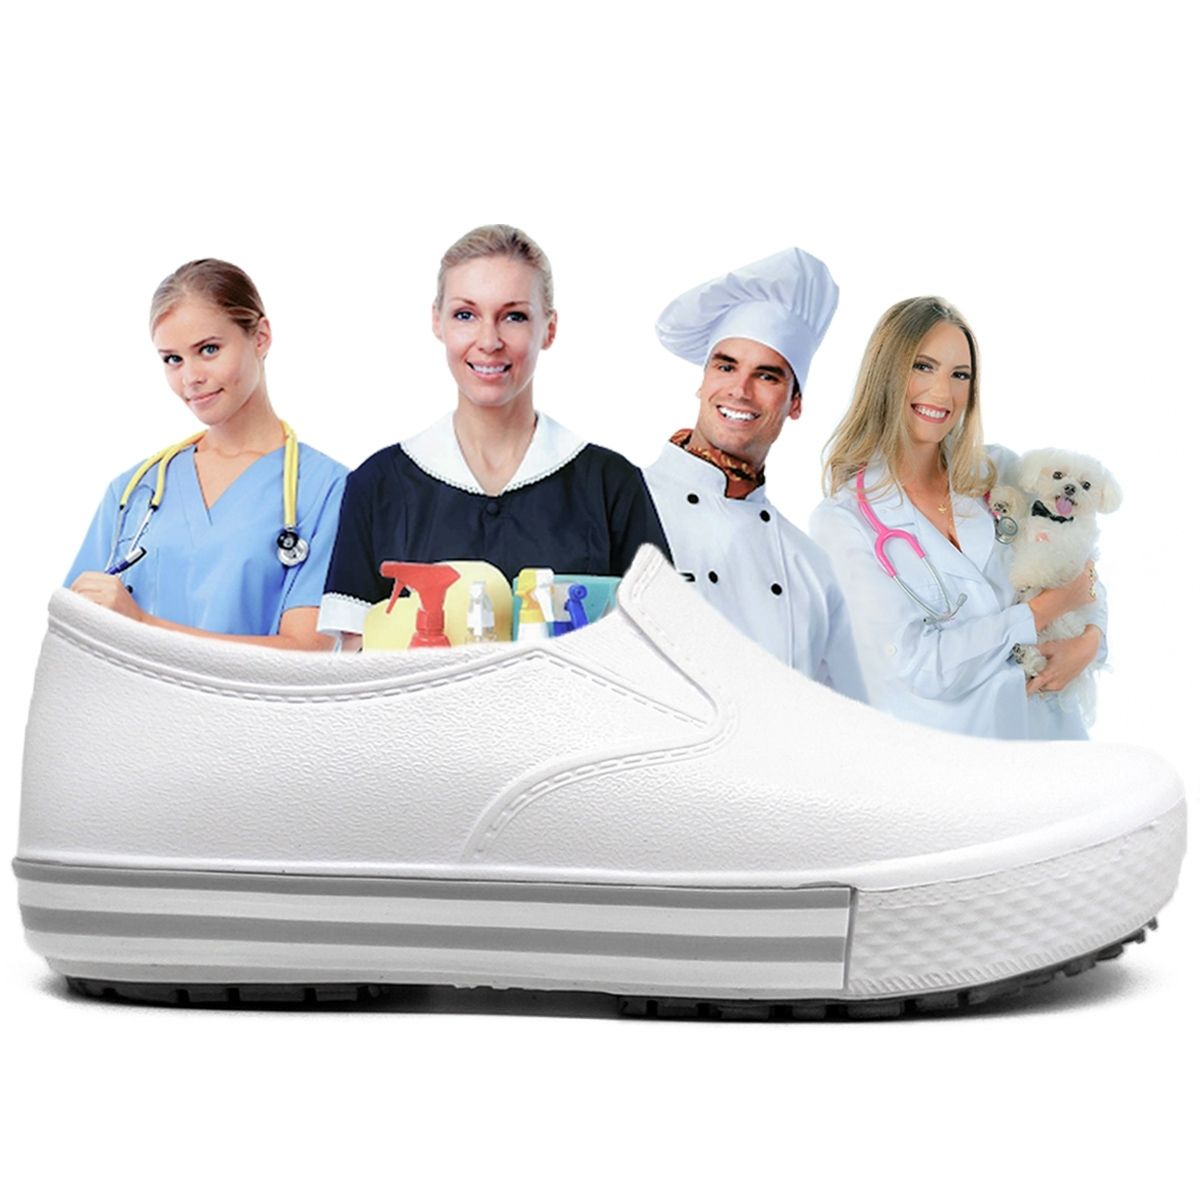 Tênis Soft Works Profissional Bb 80 Enfermagem Ca 37212